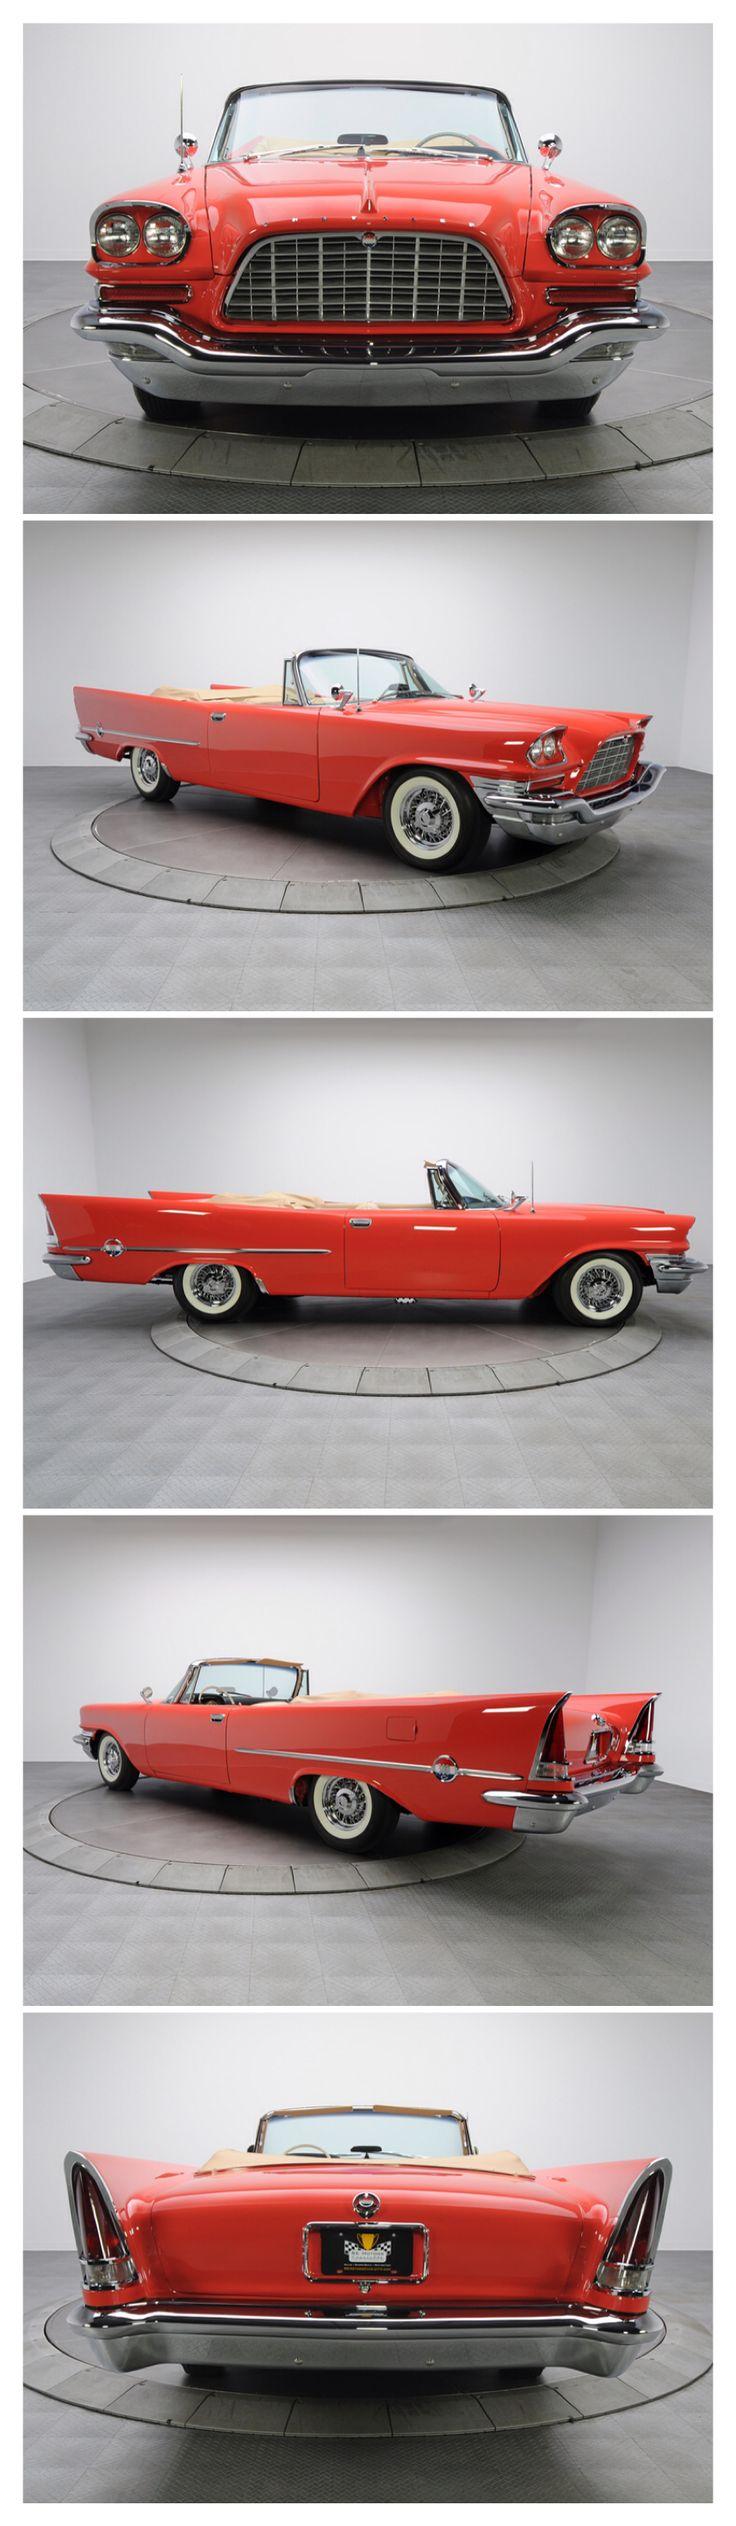 Little red wagon funny car pictures car canyon - 1957 Chrysler 300c Hemi Sealingsandexpungements Com 888 9 Expunge 888 Chrysler Carschrysler